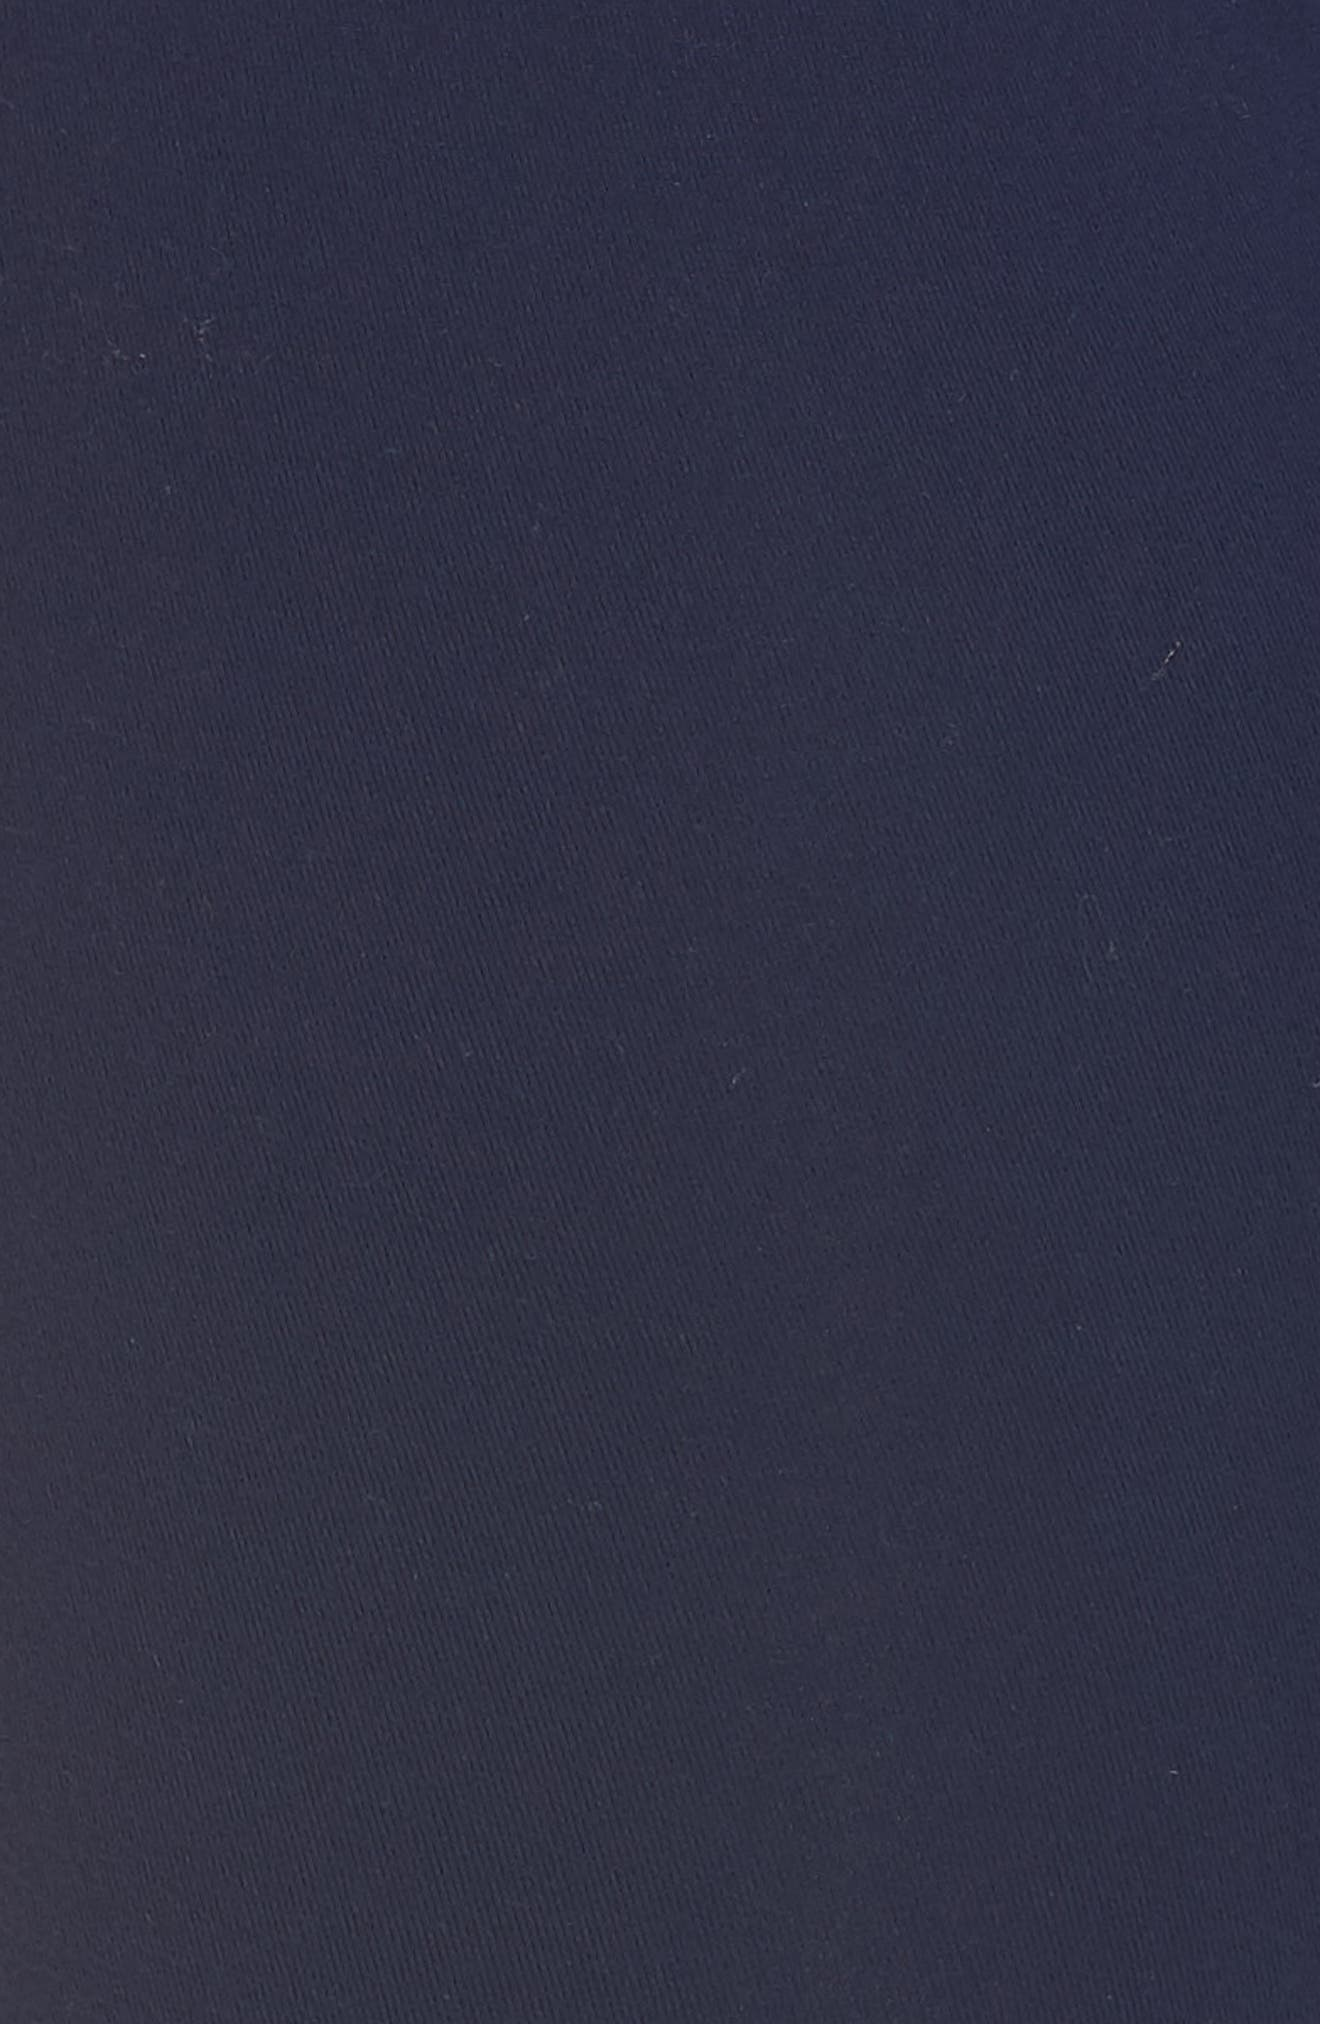 High Waist Capri Leggings,                             Alternate thumbnail 5, color,                             Nightfall